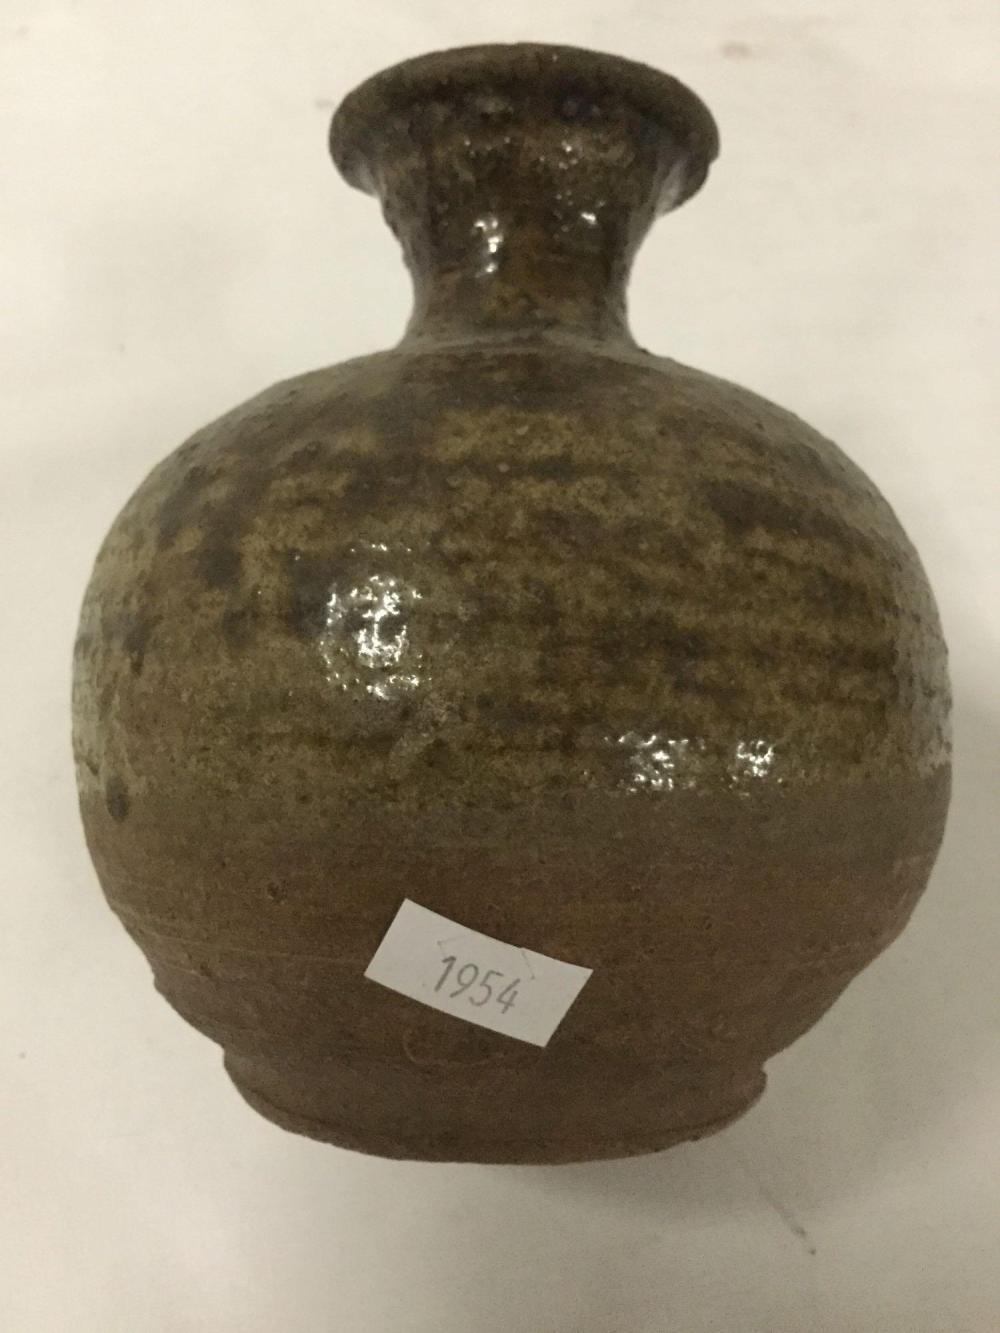 Lot 108: Circa 15th century Earthenware vase from Sankampaeng region of Thailand